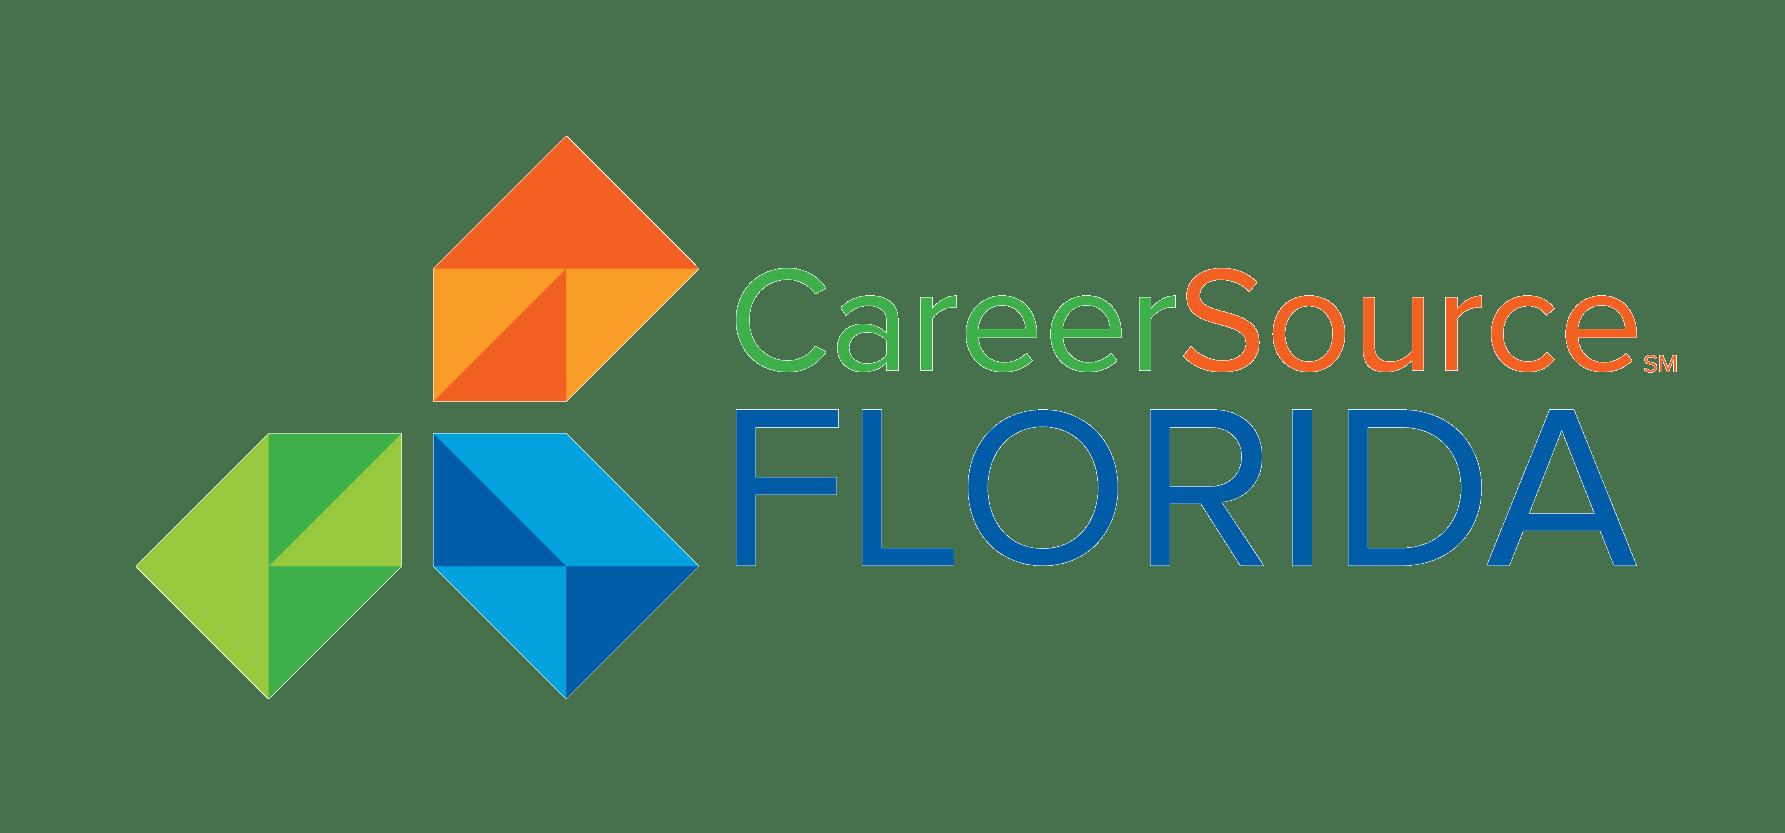 Career Source